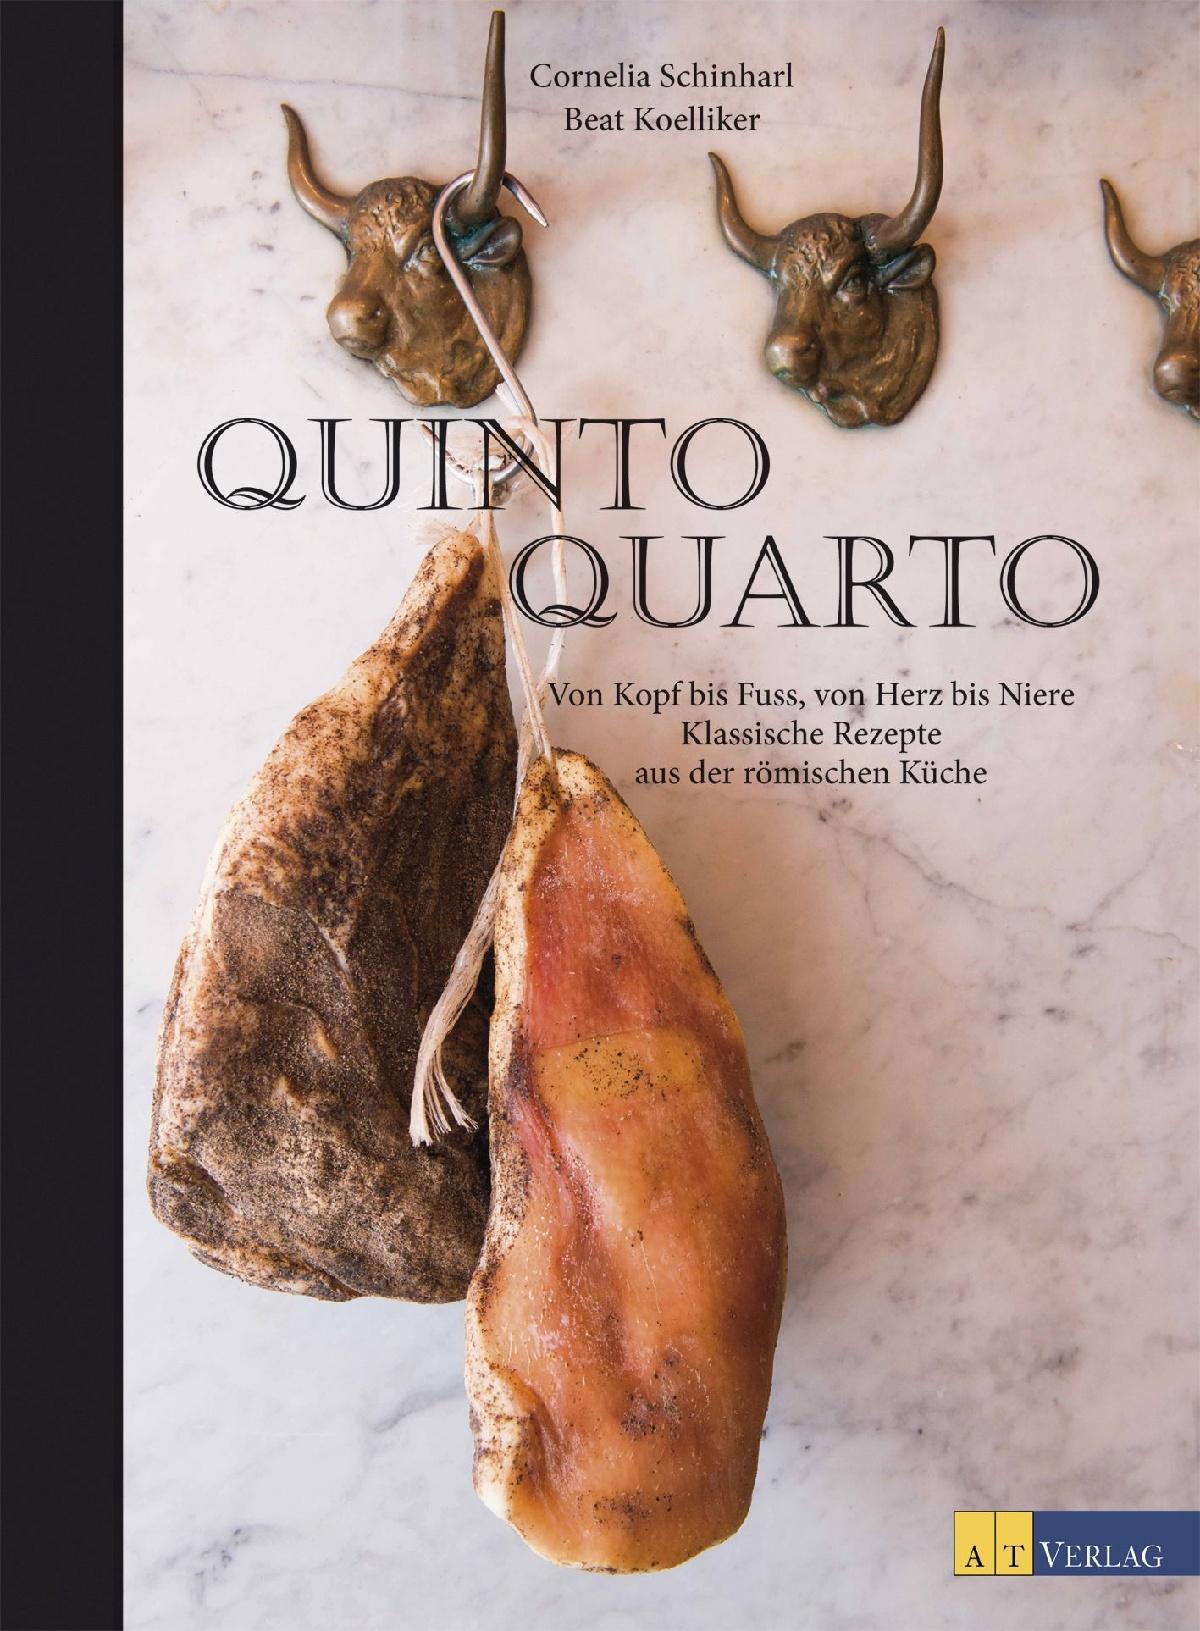 Buch: Quinto Quarto von Cornelia Schinharl, Beat Koelliker • AT Verlag